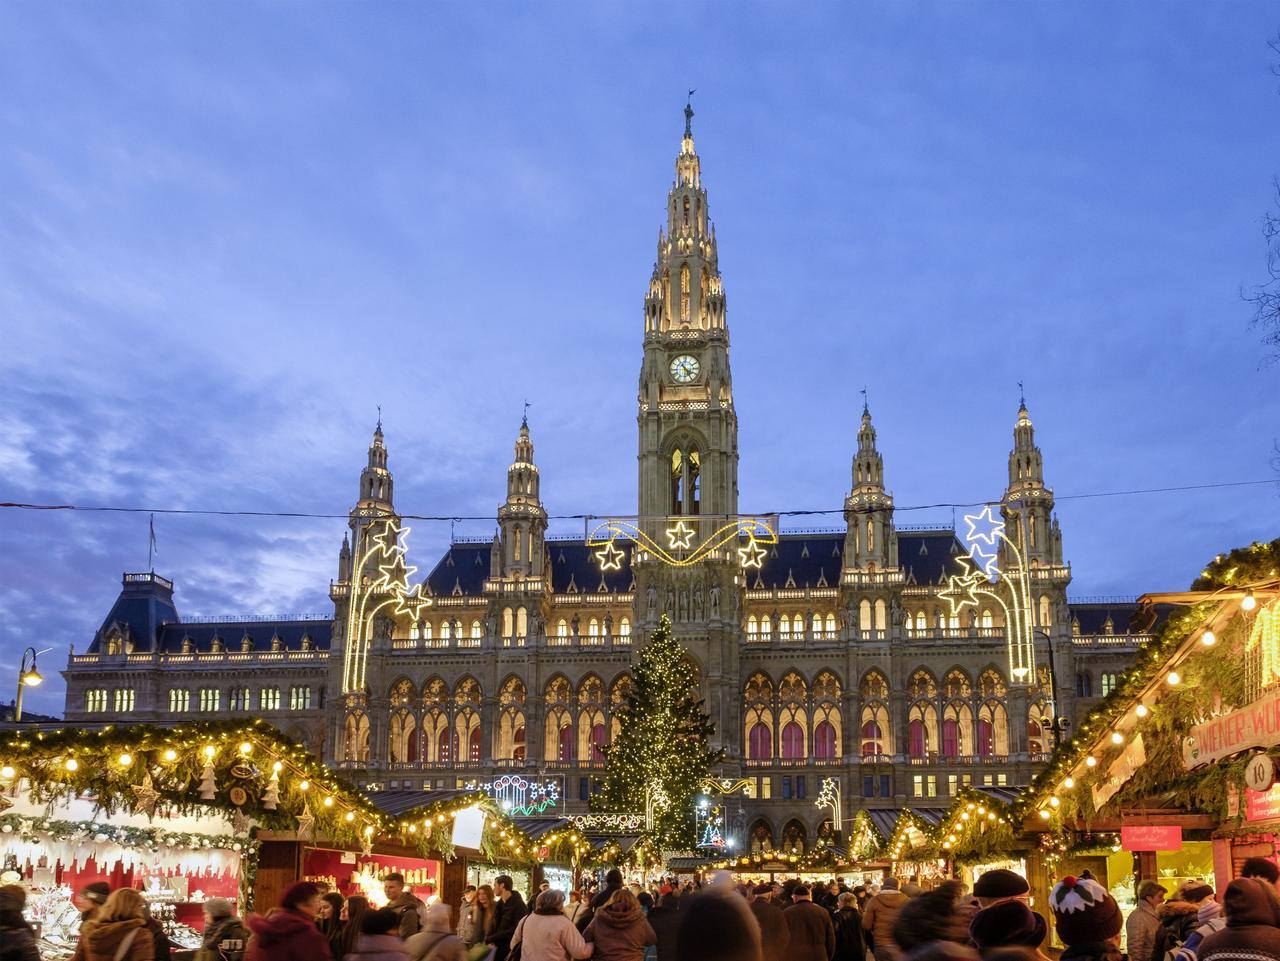 Vienna at Christmas, Rathausplatz & Vienna City Hall - Austria